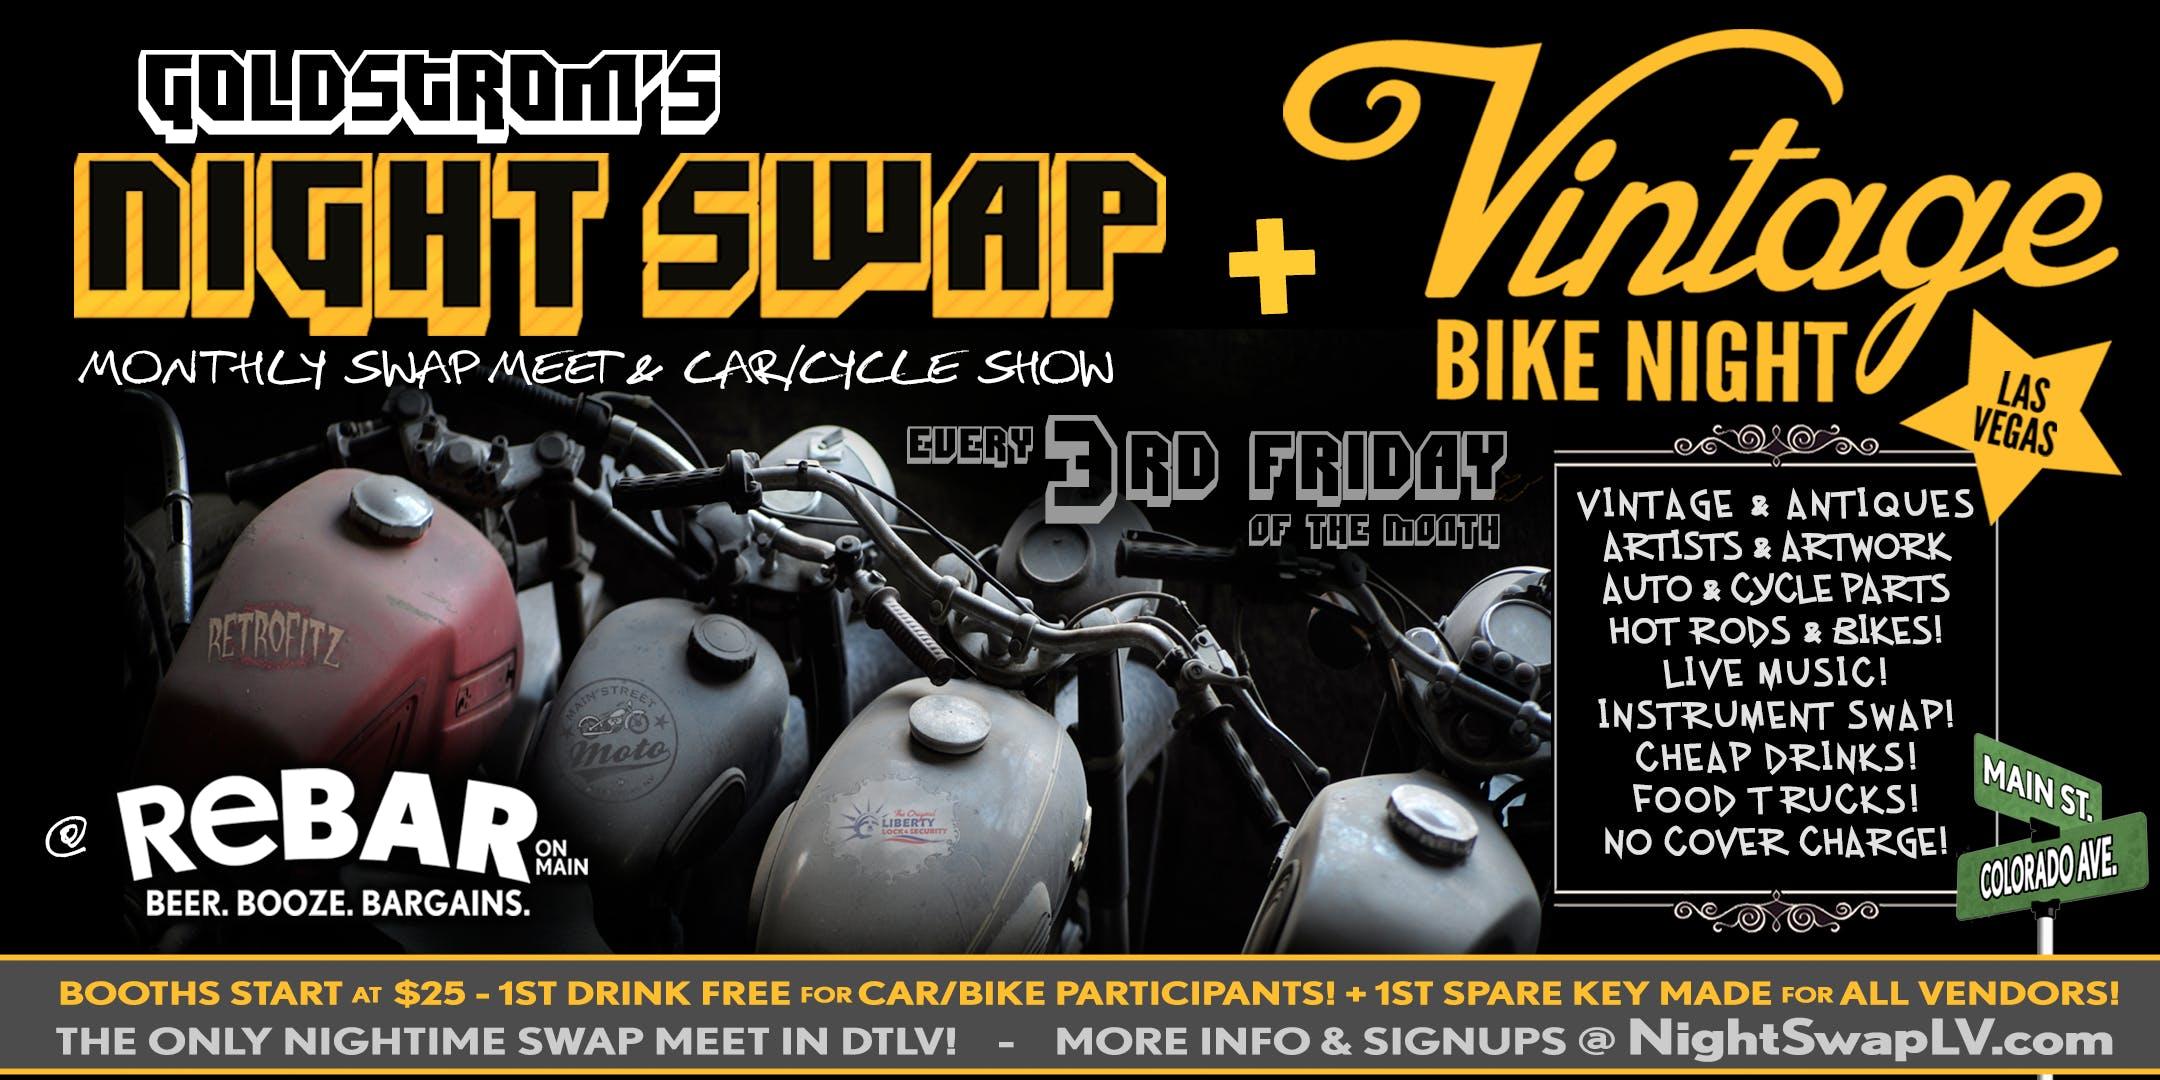 Goldstrom S Nightswap Vintage Bike Night 3rd Fridays